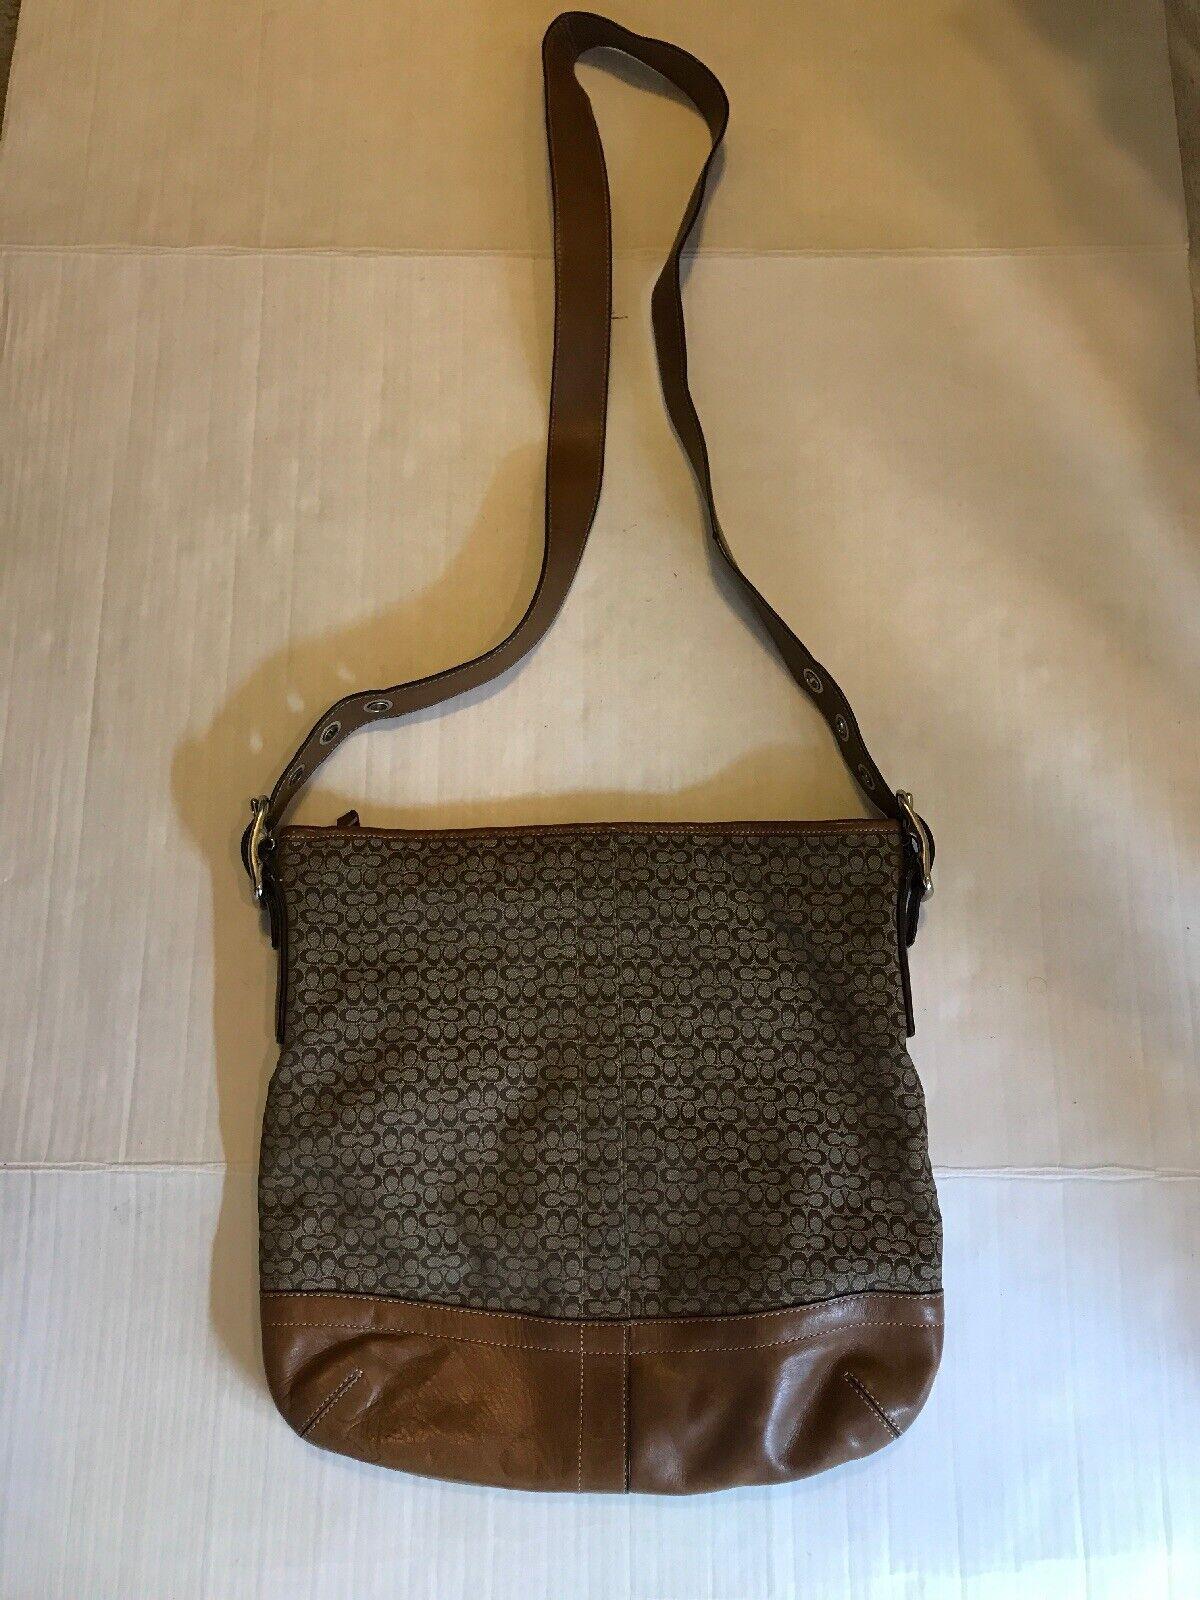 Coach Monogram Canvas Tan Crossbody/Shoulder Bag - image 1